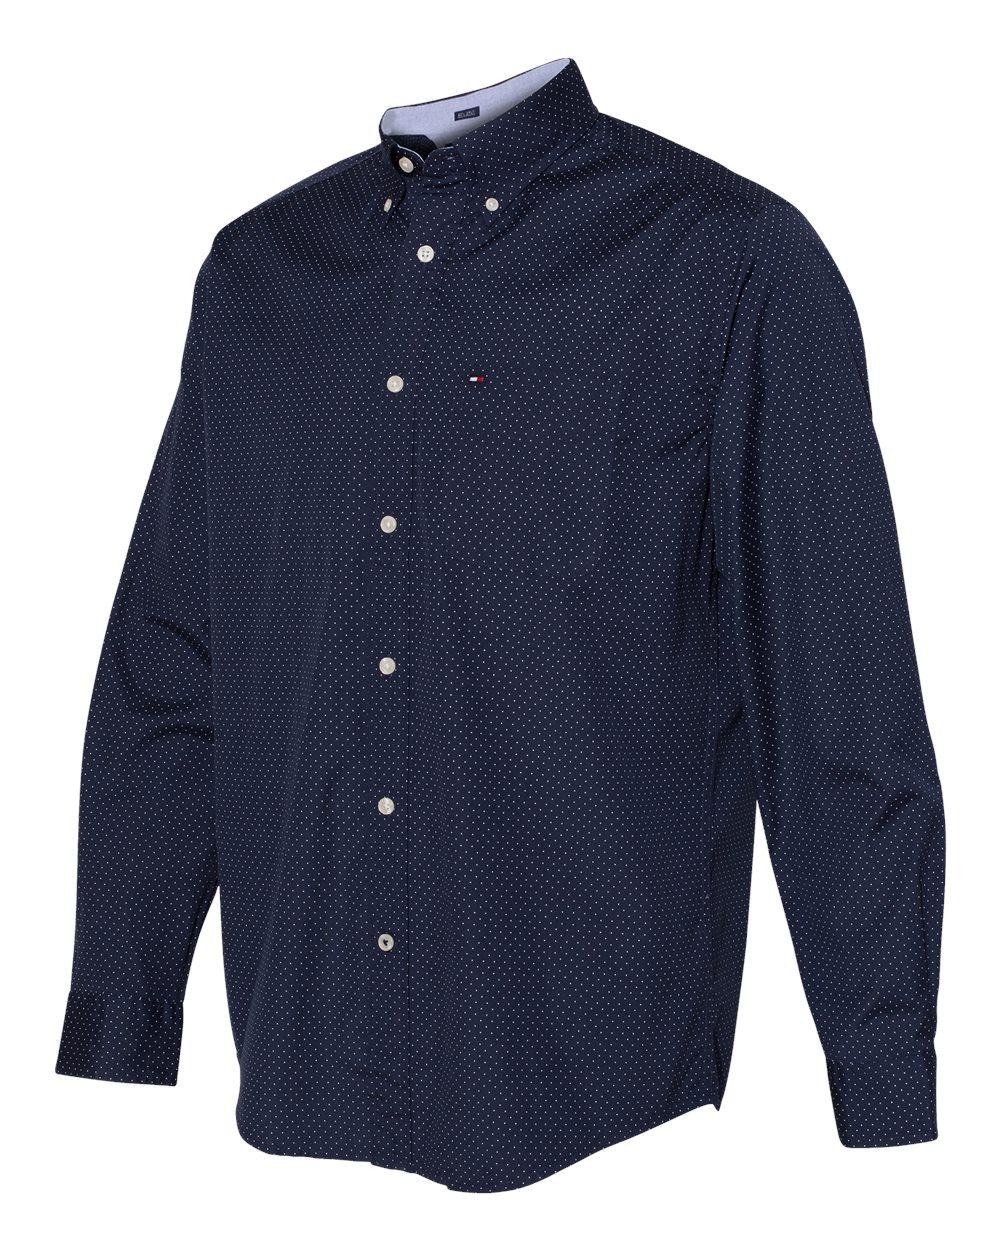 Tommy Hilfiger 13H4417 - 100s Two-Ply Polka Dot Shirt